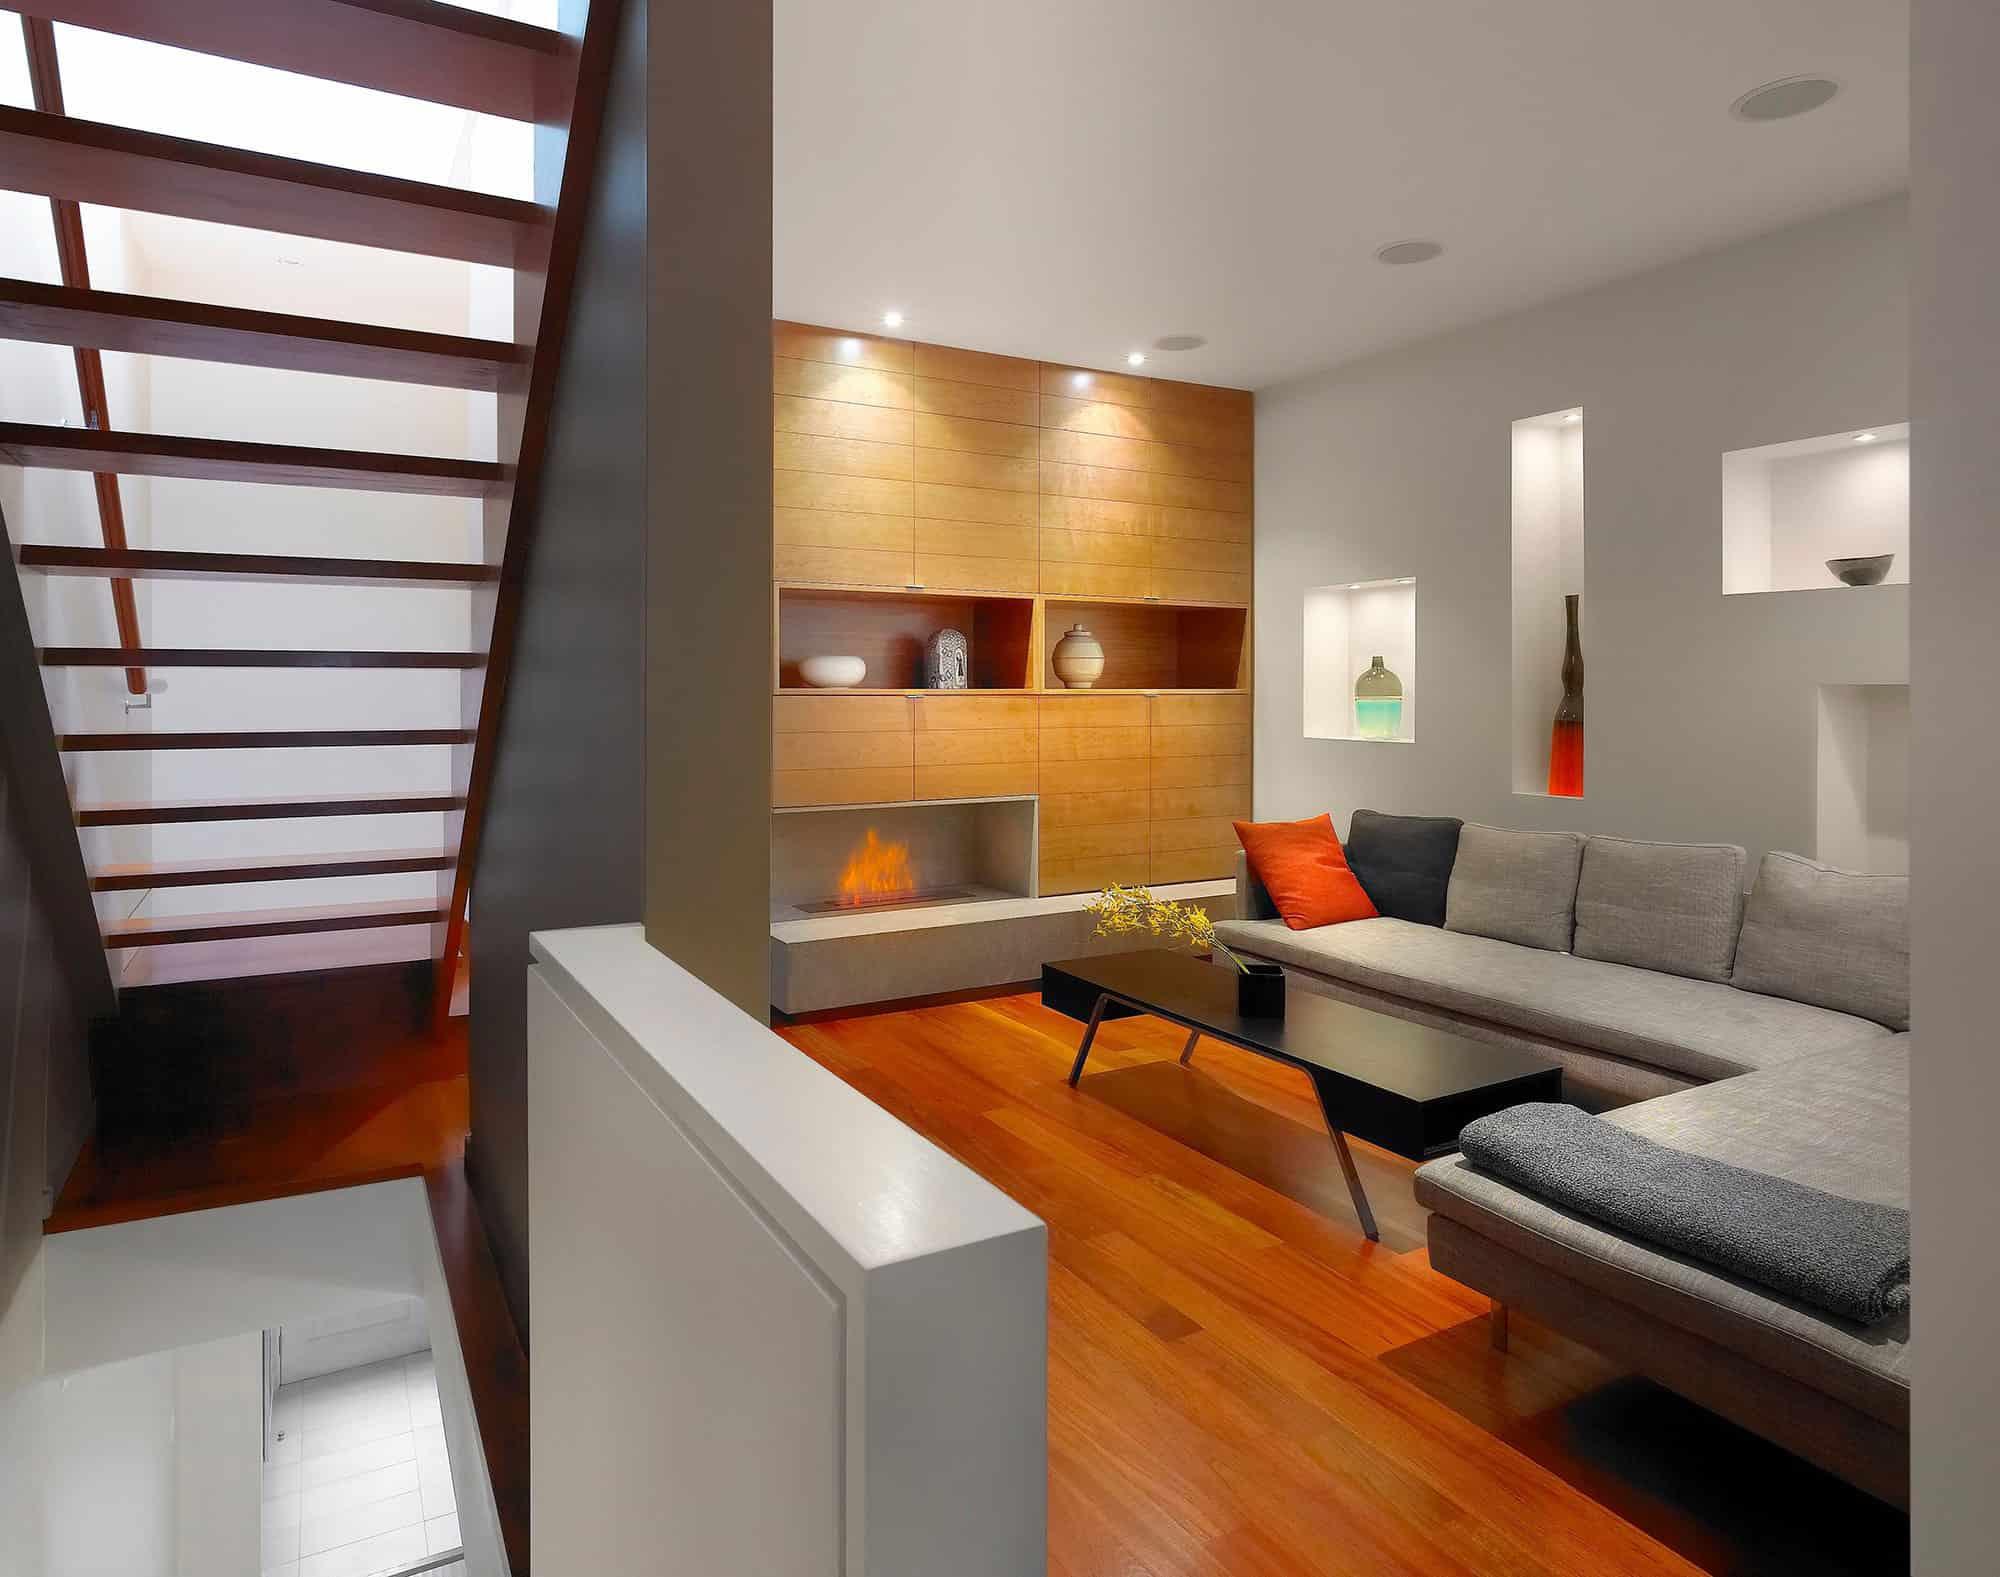 Cabbagetown Residence by DUBBELDAM Architecture + Design